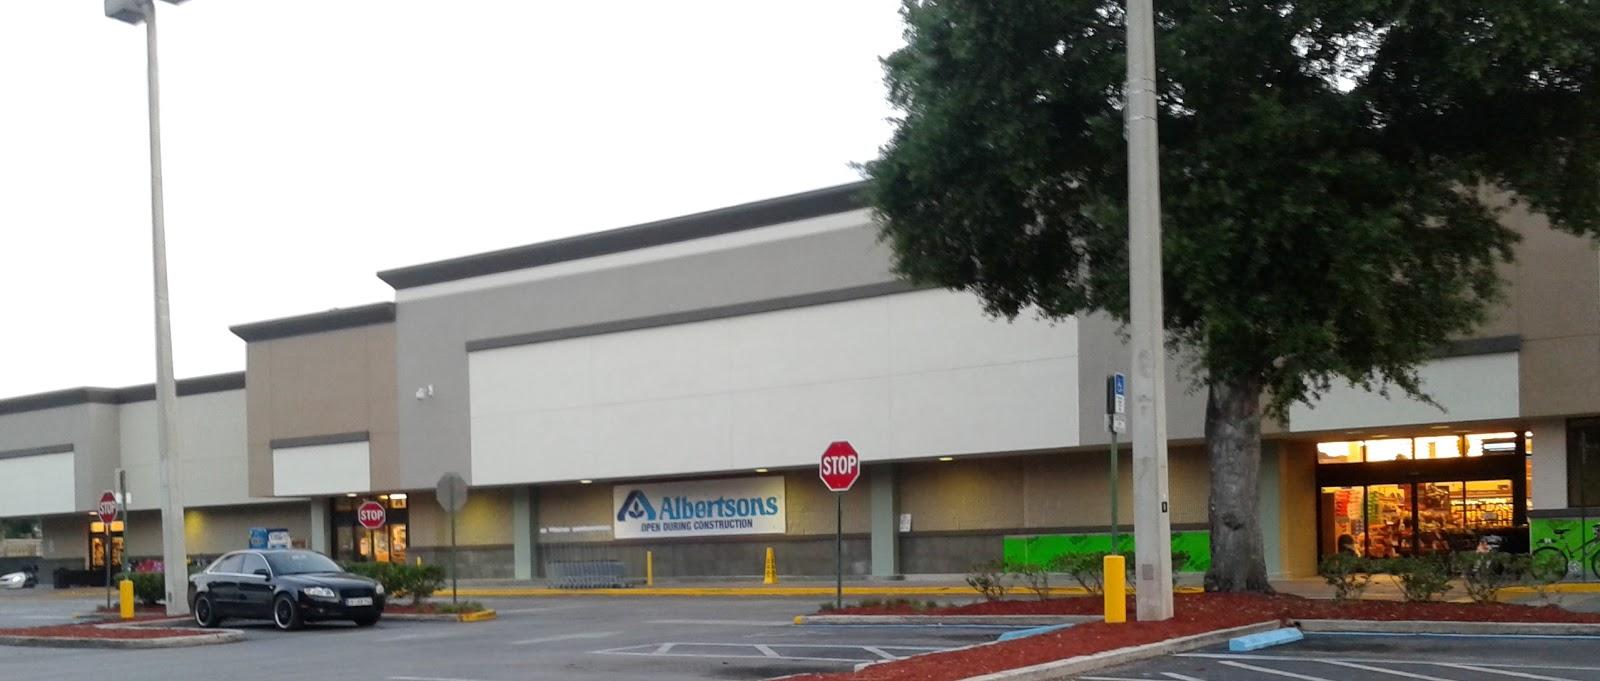 Albertsons Florida Blog Heres Safeway Safeway 3304 Altamonte